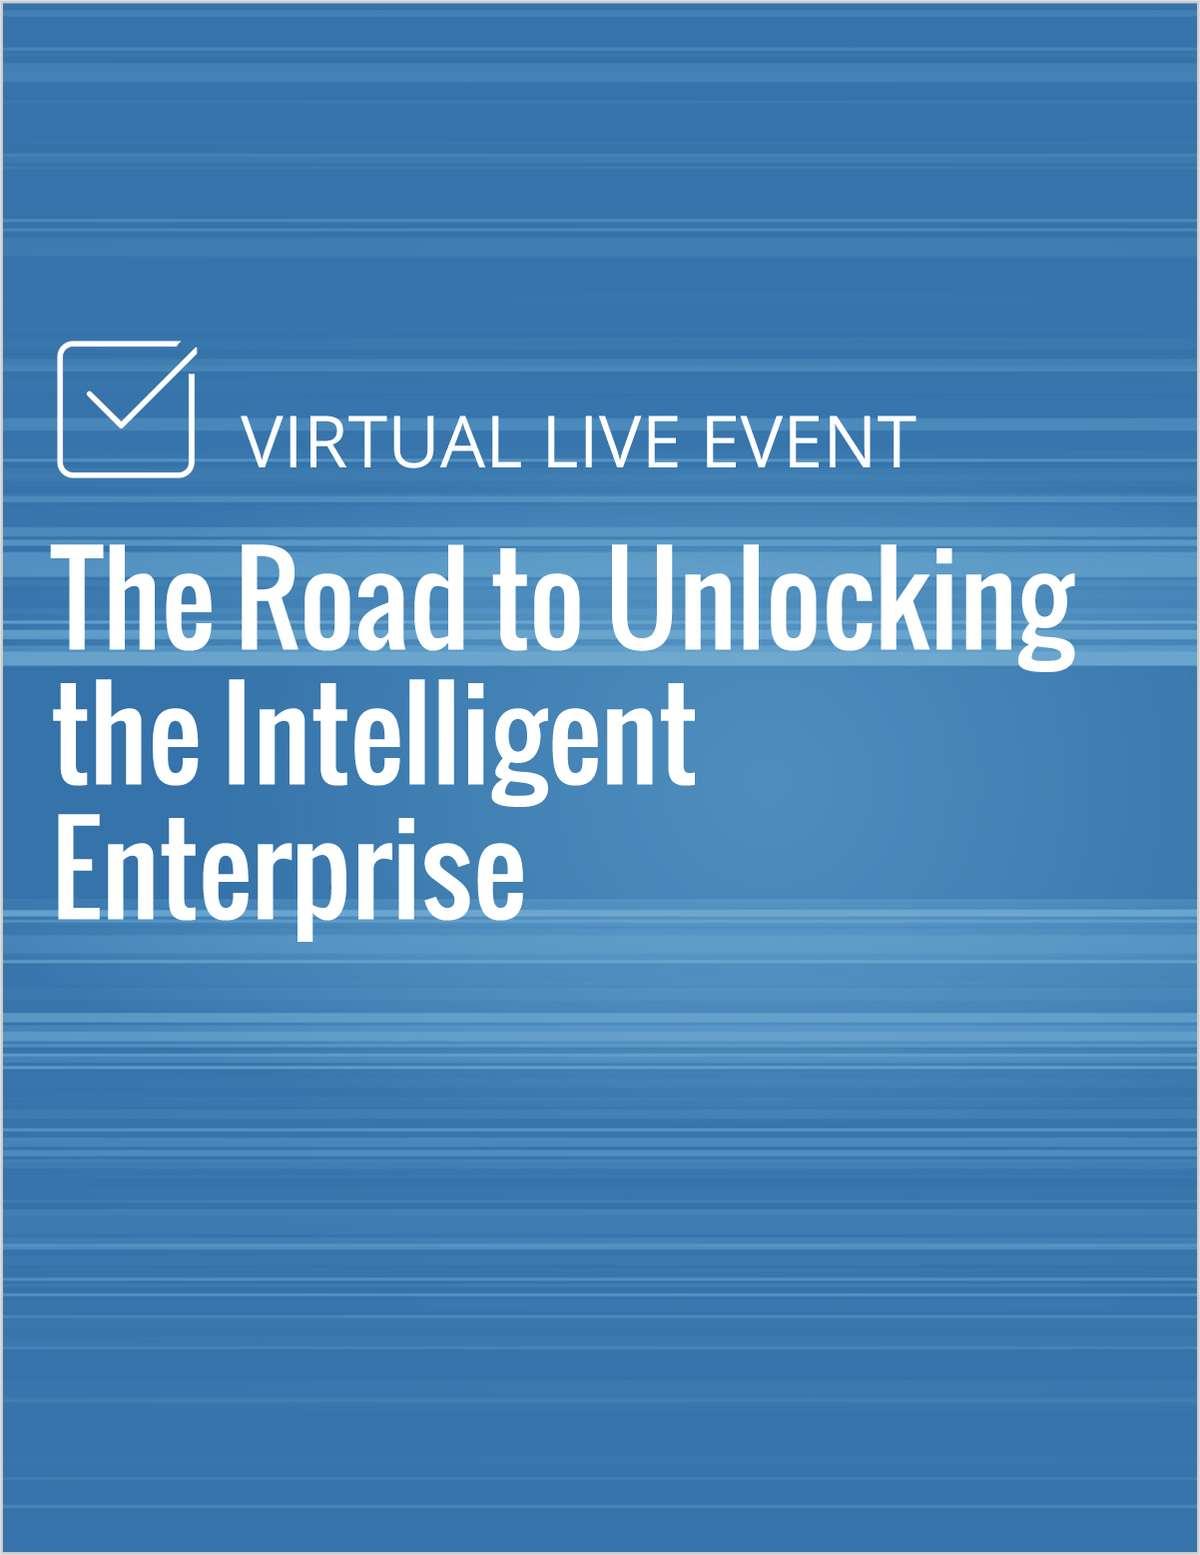 The Road to Unlocking the Intelligent Enterprise